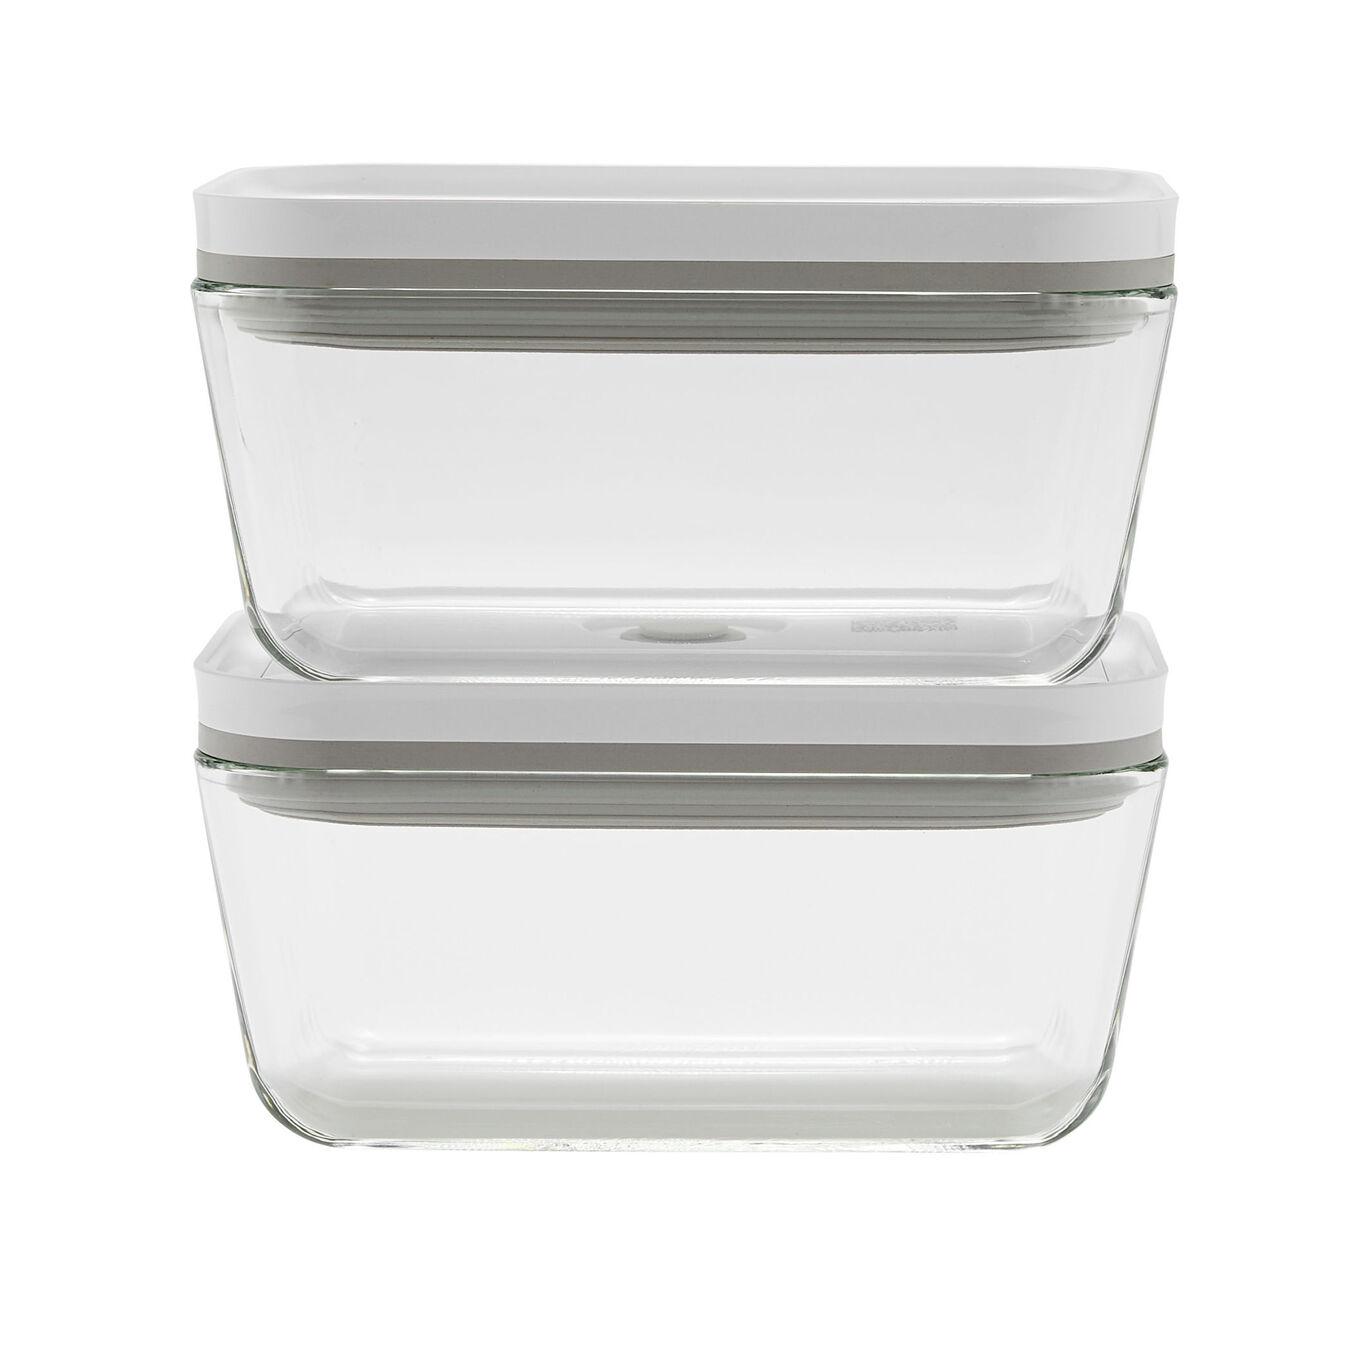 Vacuum box set, medium / 2-pc, White,,large 1